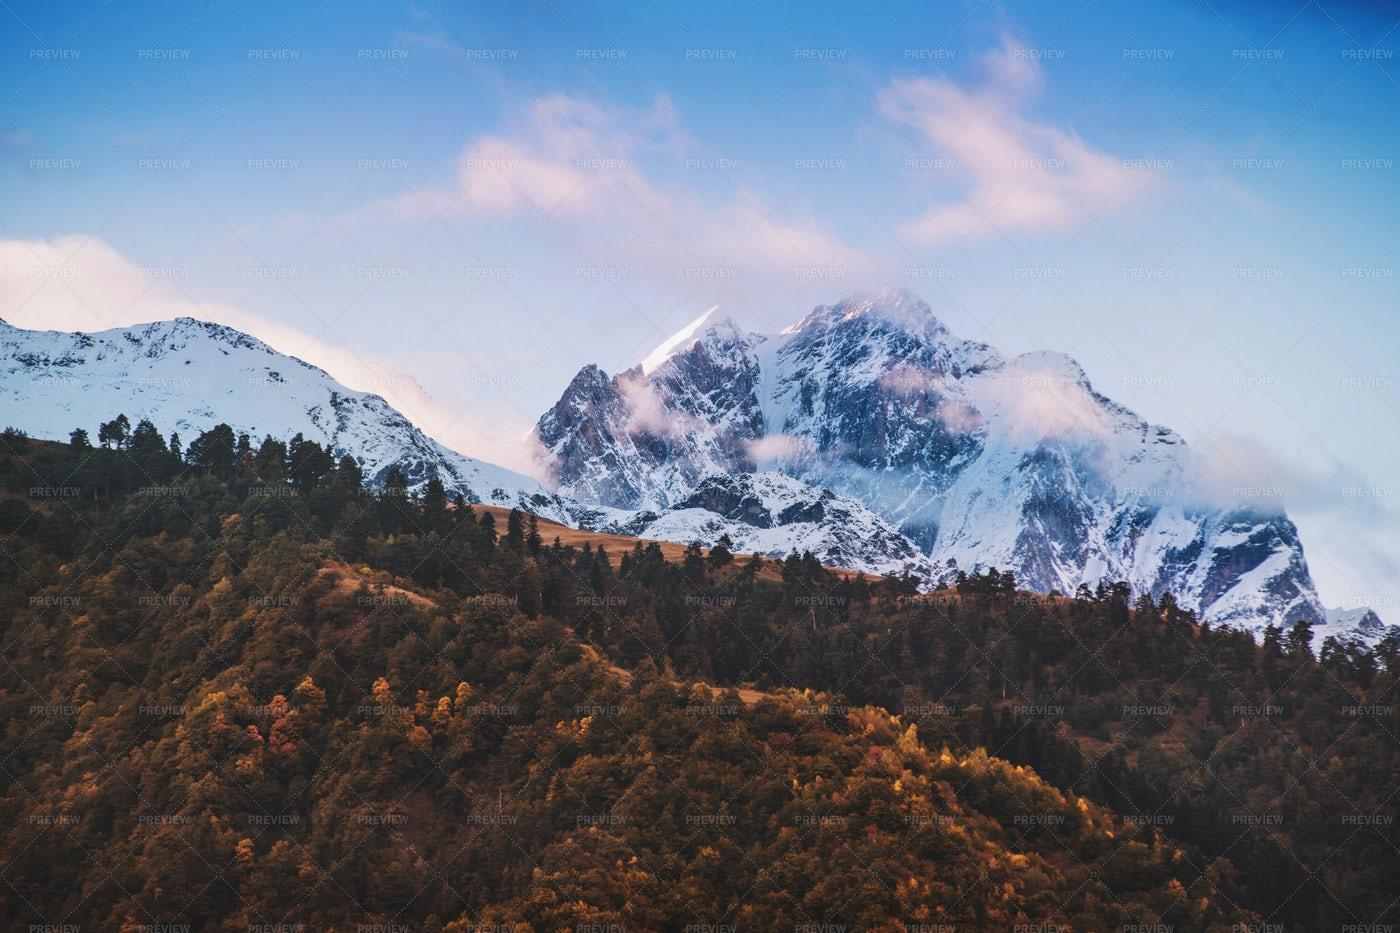 Snowy Peaks Of Autumn Mountain: Stock Photos